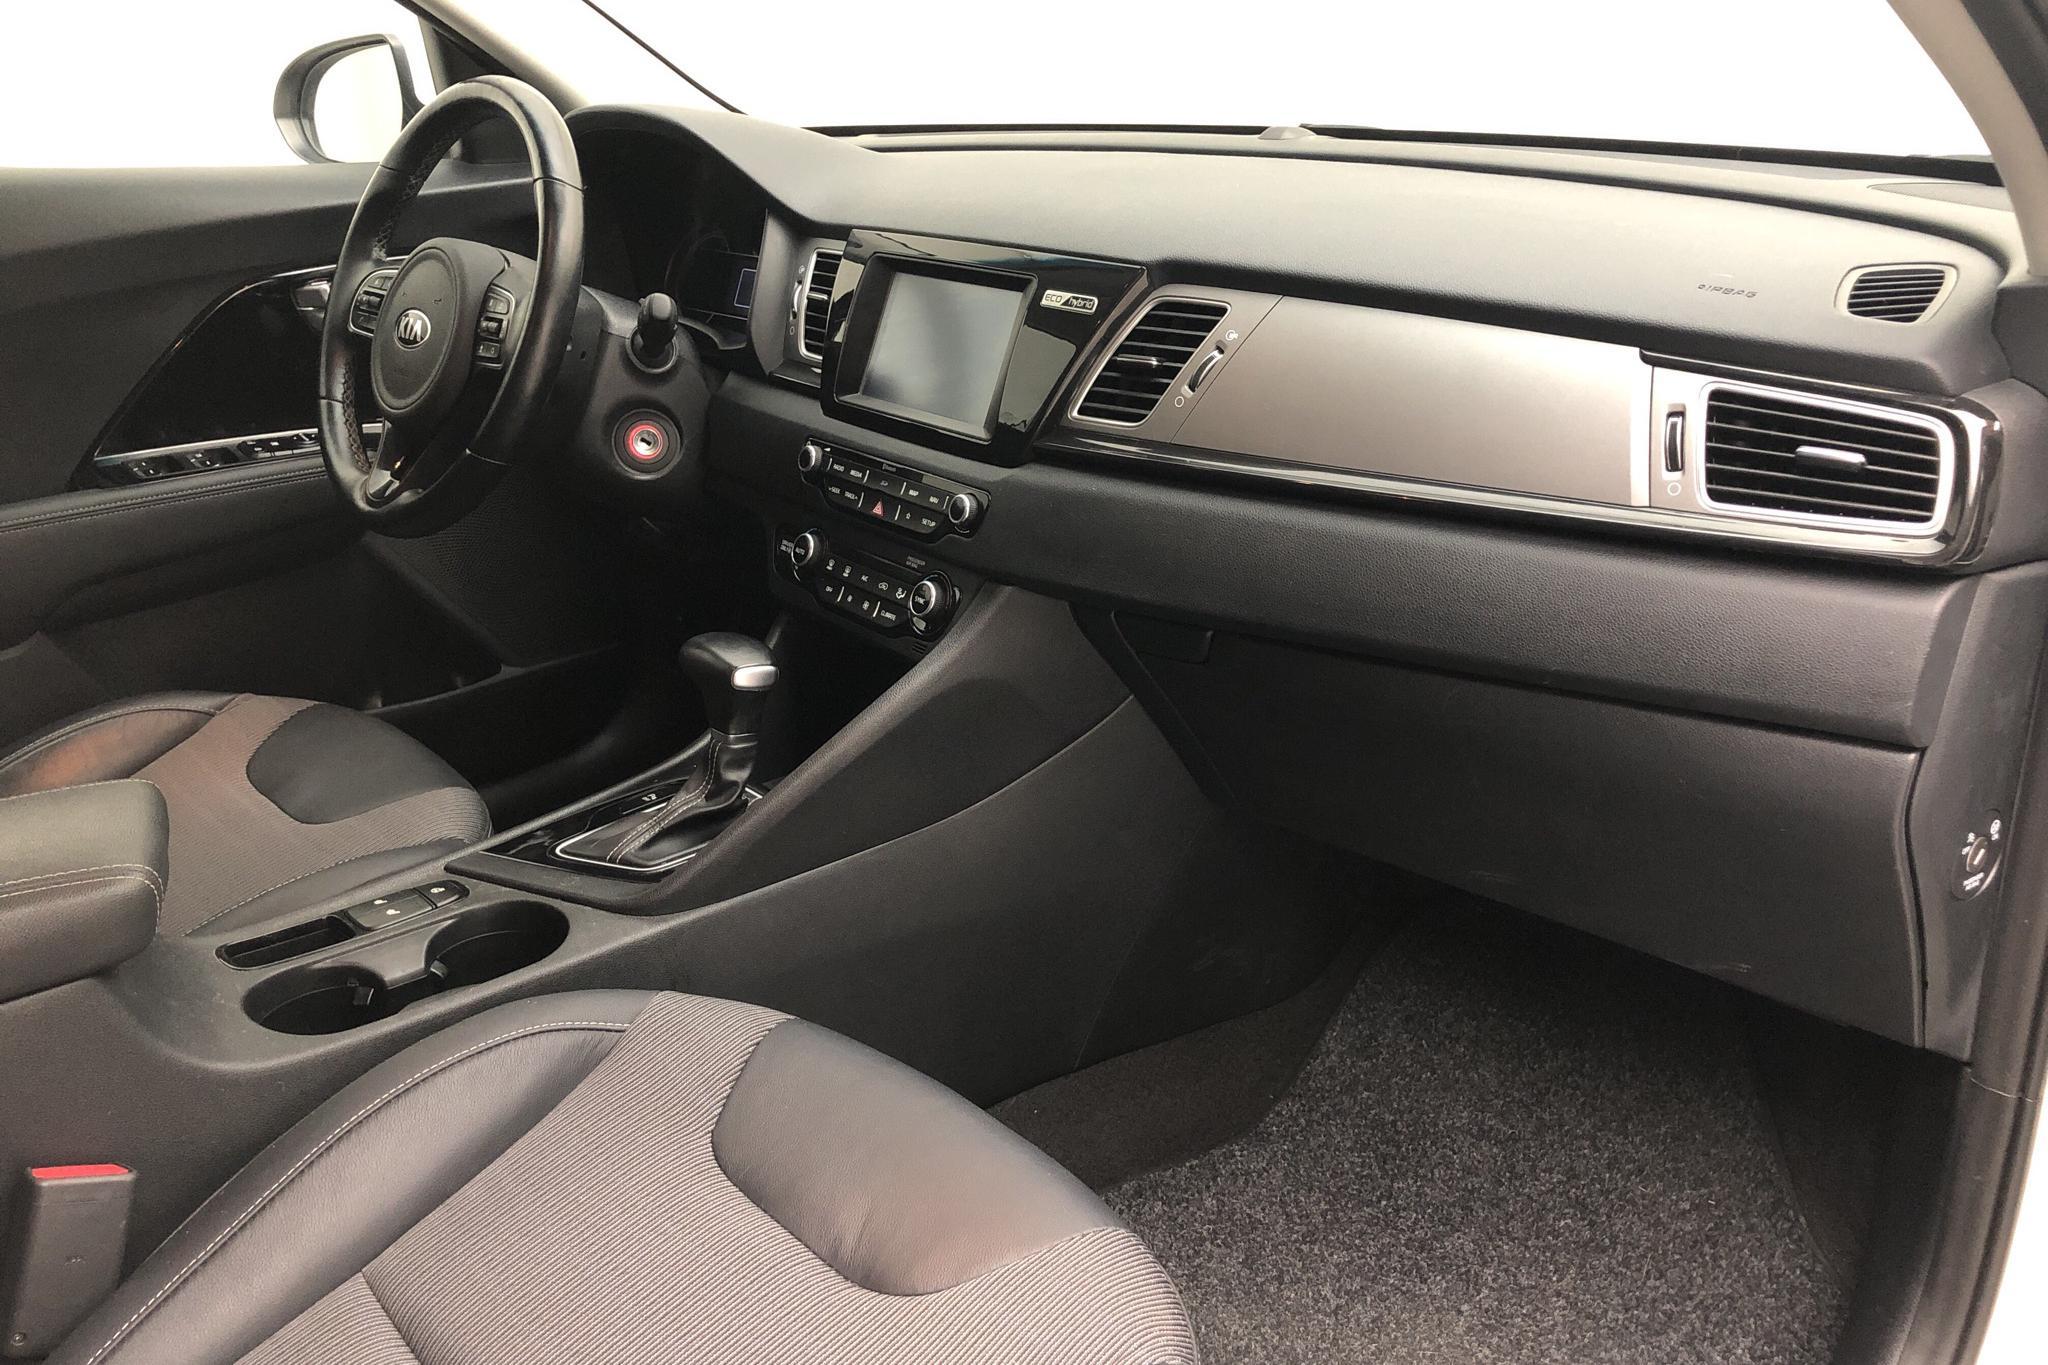 KIA Niro Hybrid 1.6 (141hk) - 41 390 km - Automatic - white - 2019